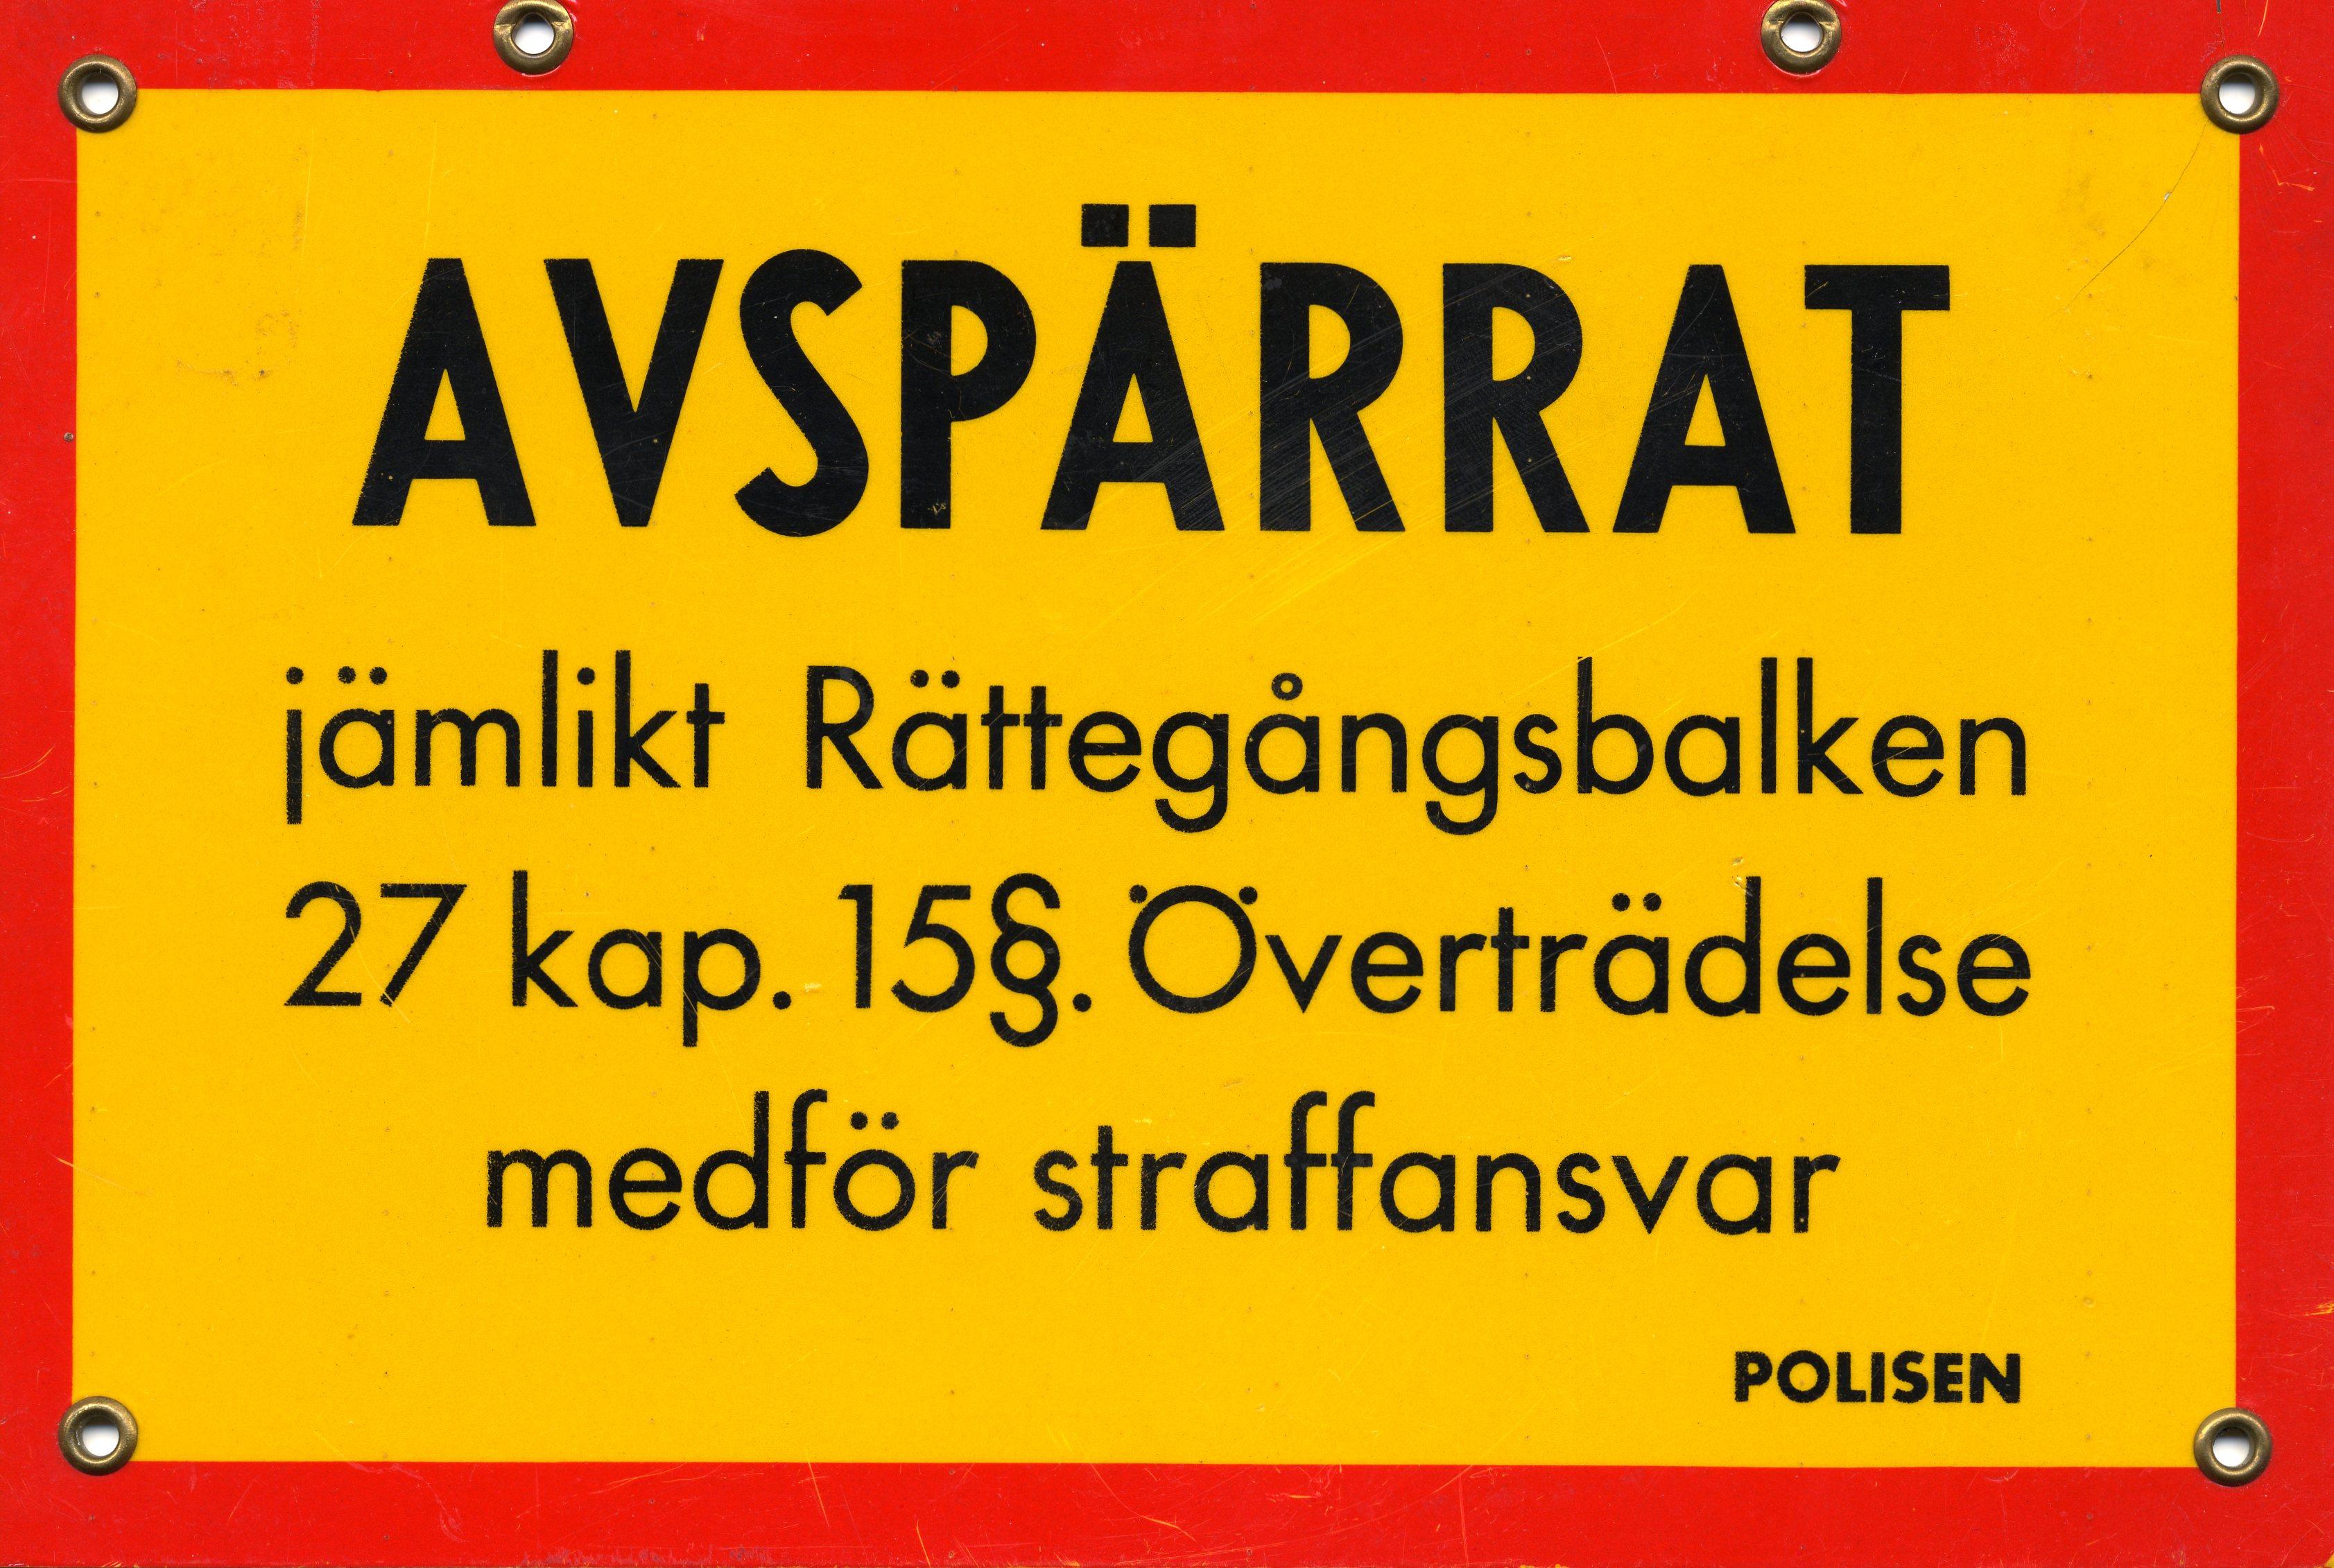 Description Swedish crime scene police sign.jpg